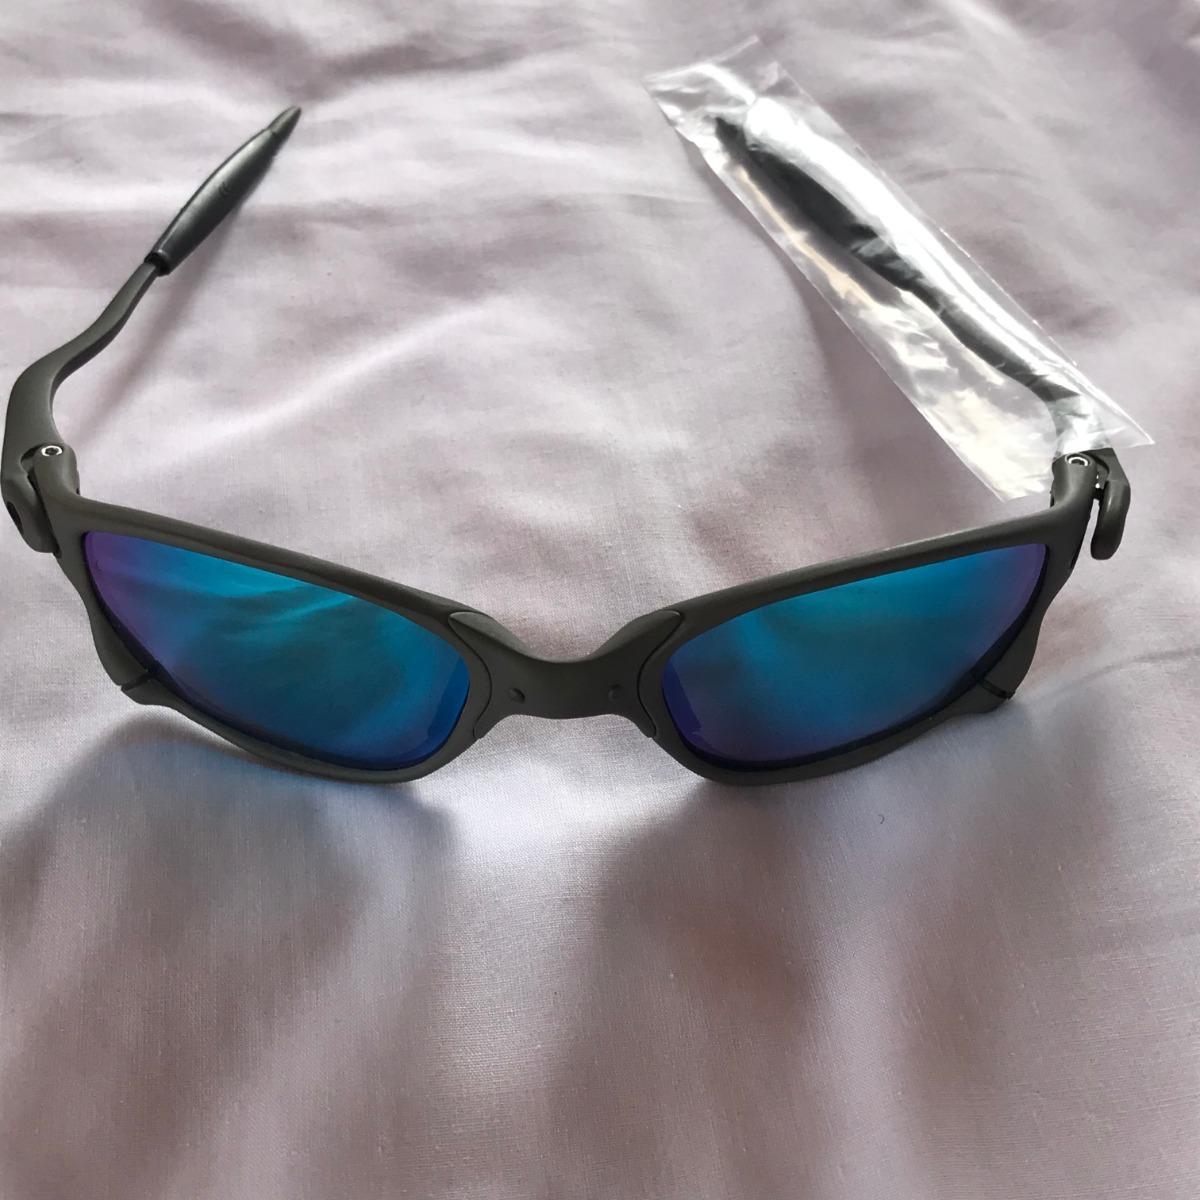 eb0d35927f8f1 Carregando zoom... óculos oakley x metal double x 24k lentes azul juliet  lupa